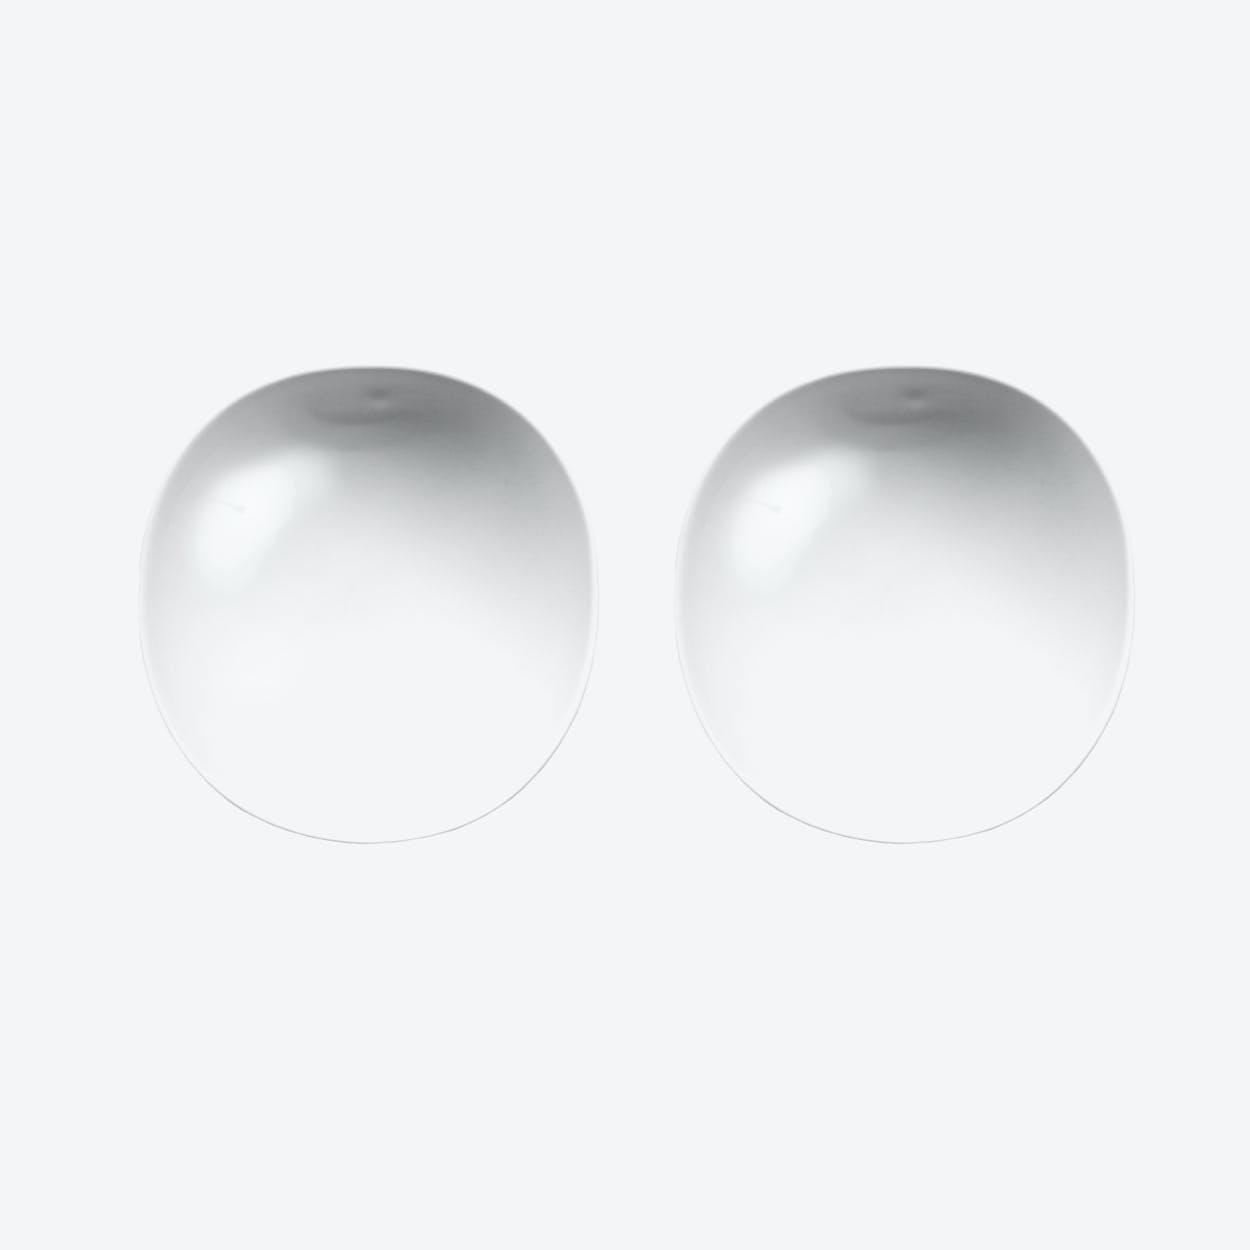 Glazed Shell Ramen Bowl - set of 2